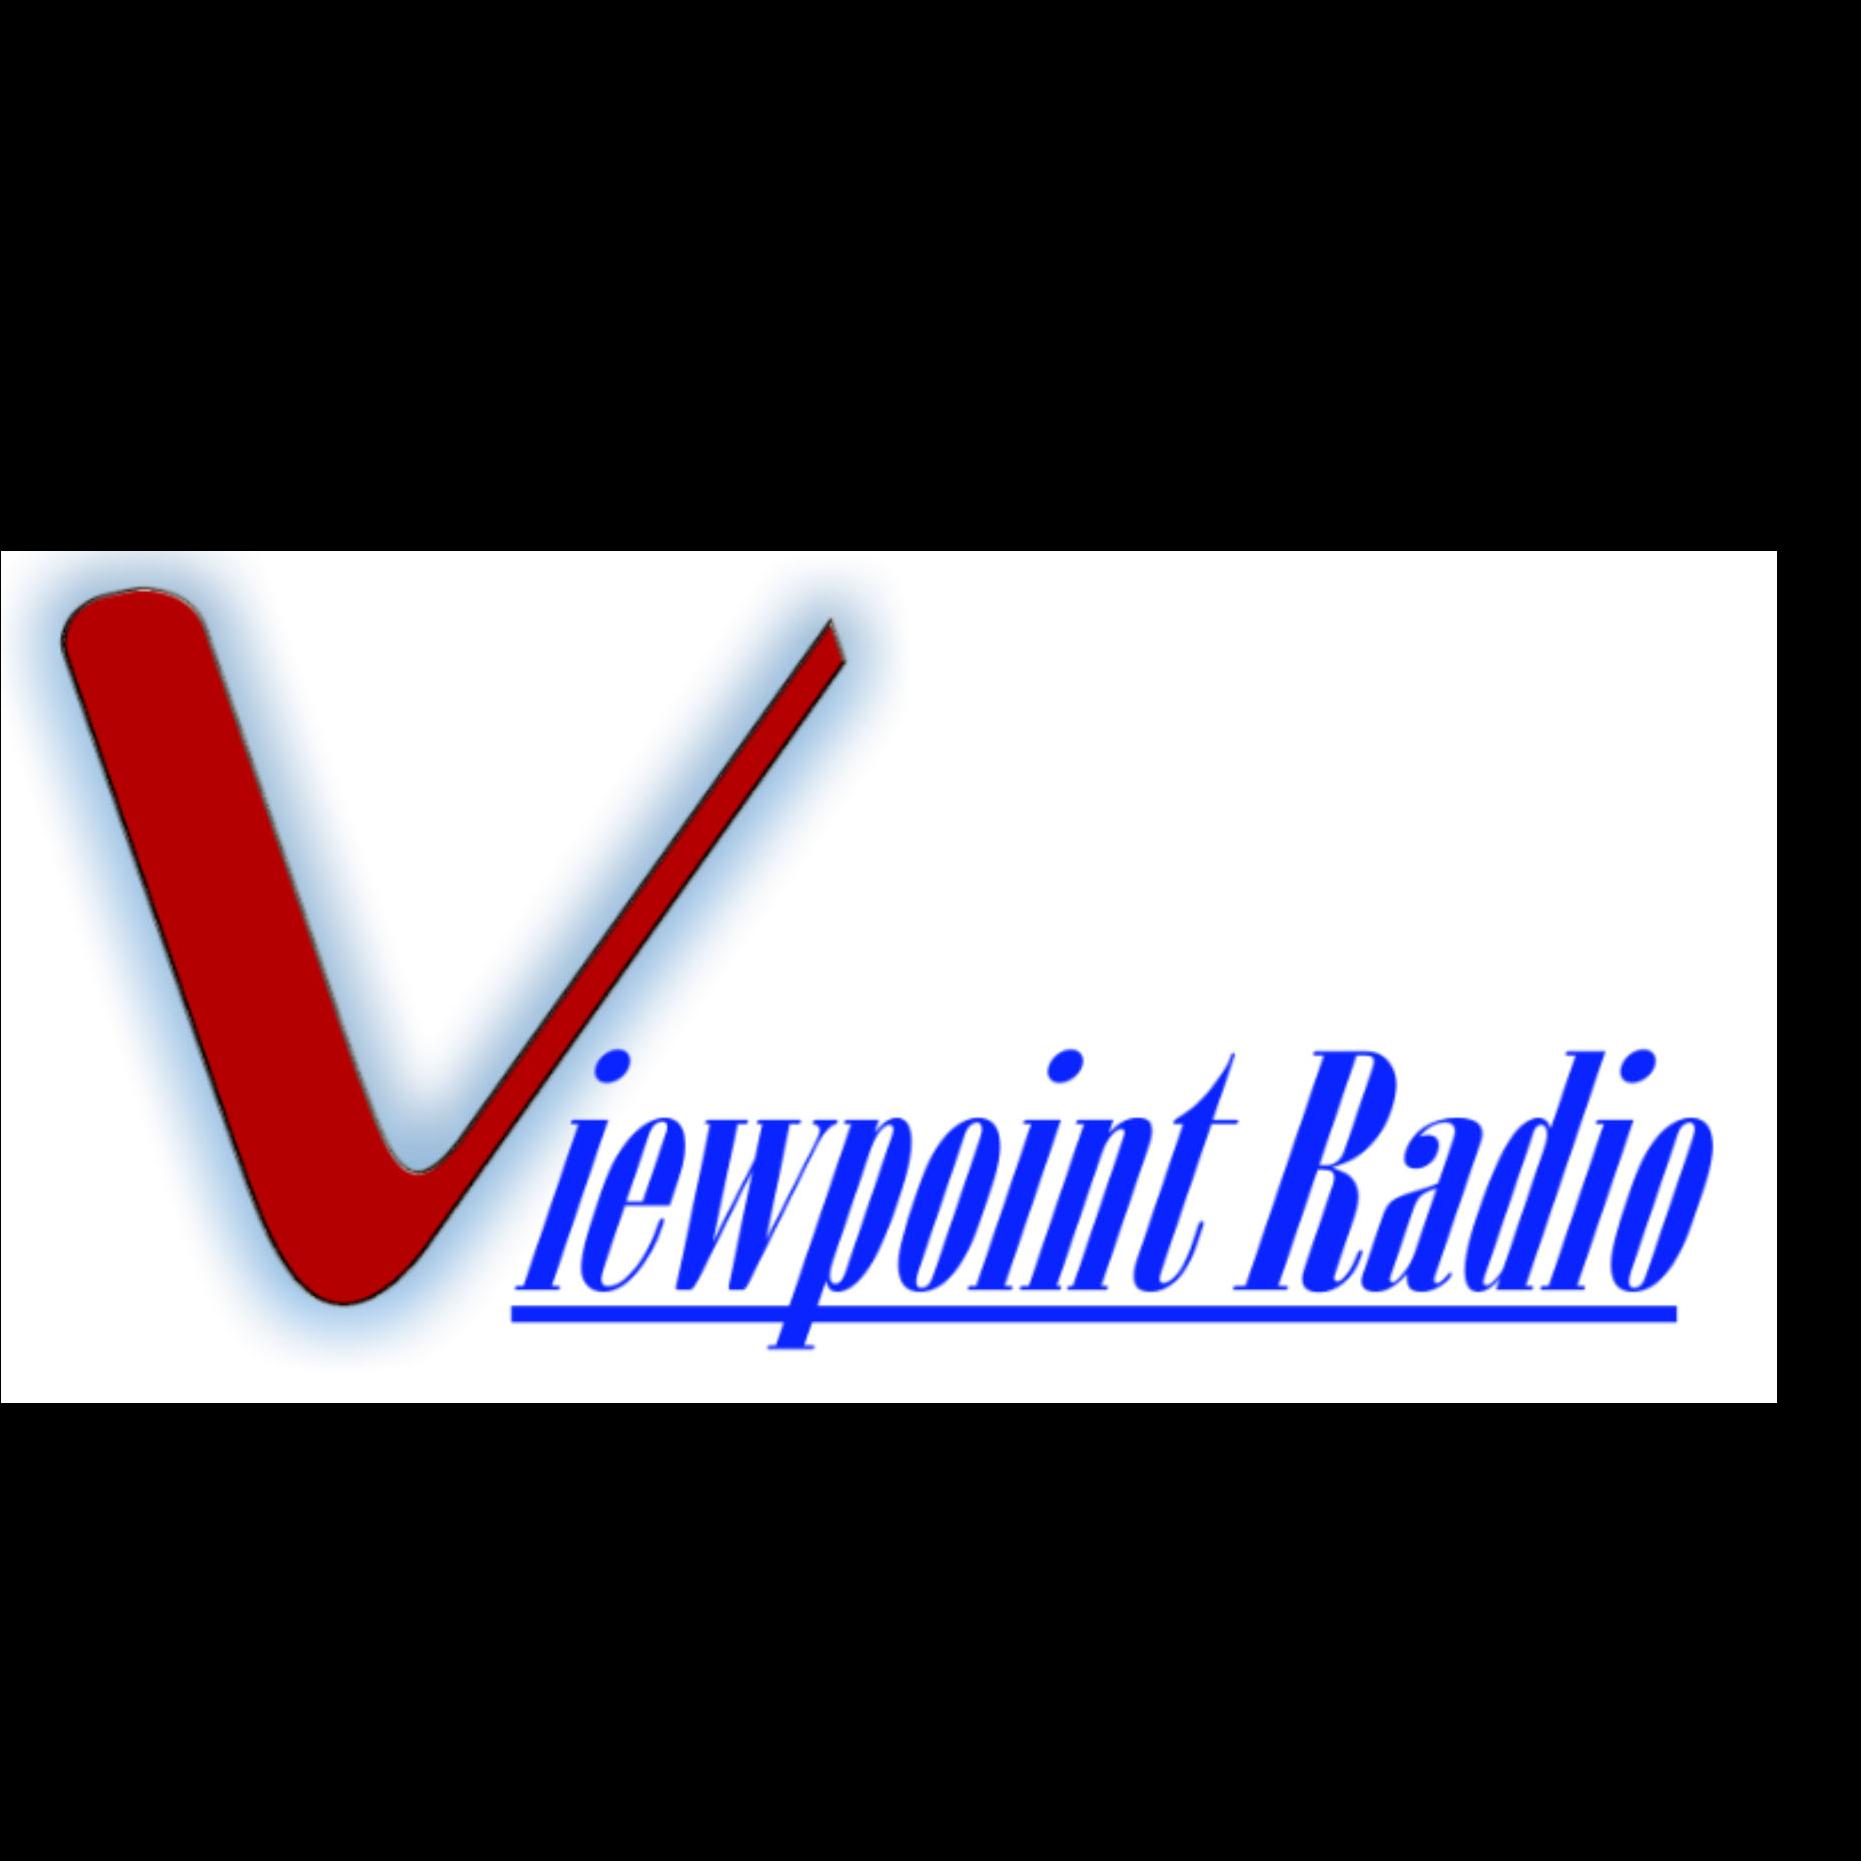 Viewpoint Radio CA!